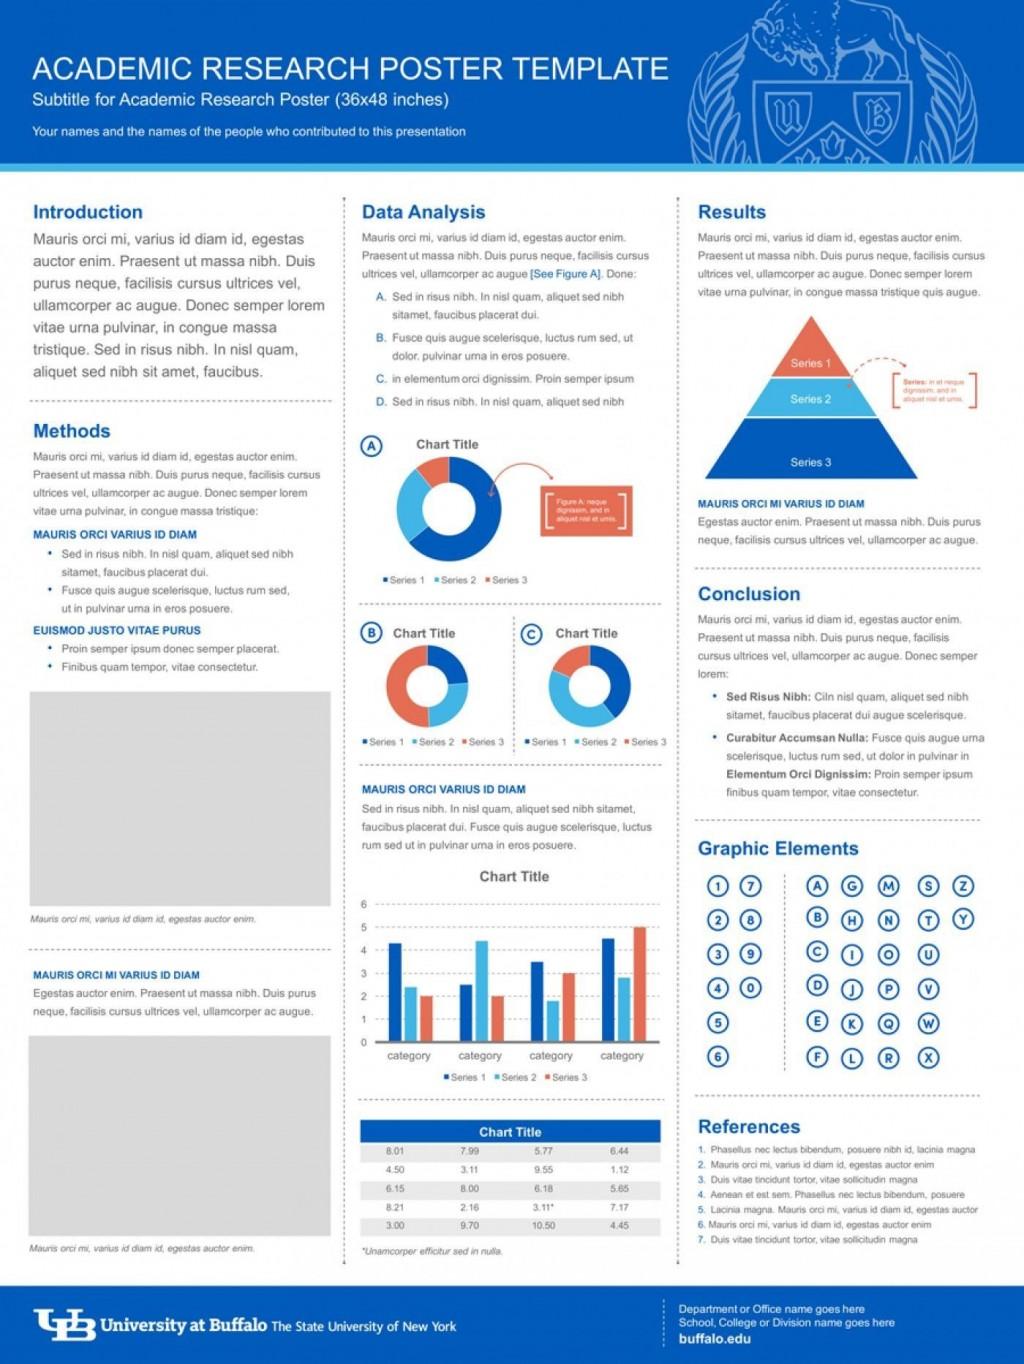 008 Shocking Scientific Poster Presentation Template Free Download Sample Large